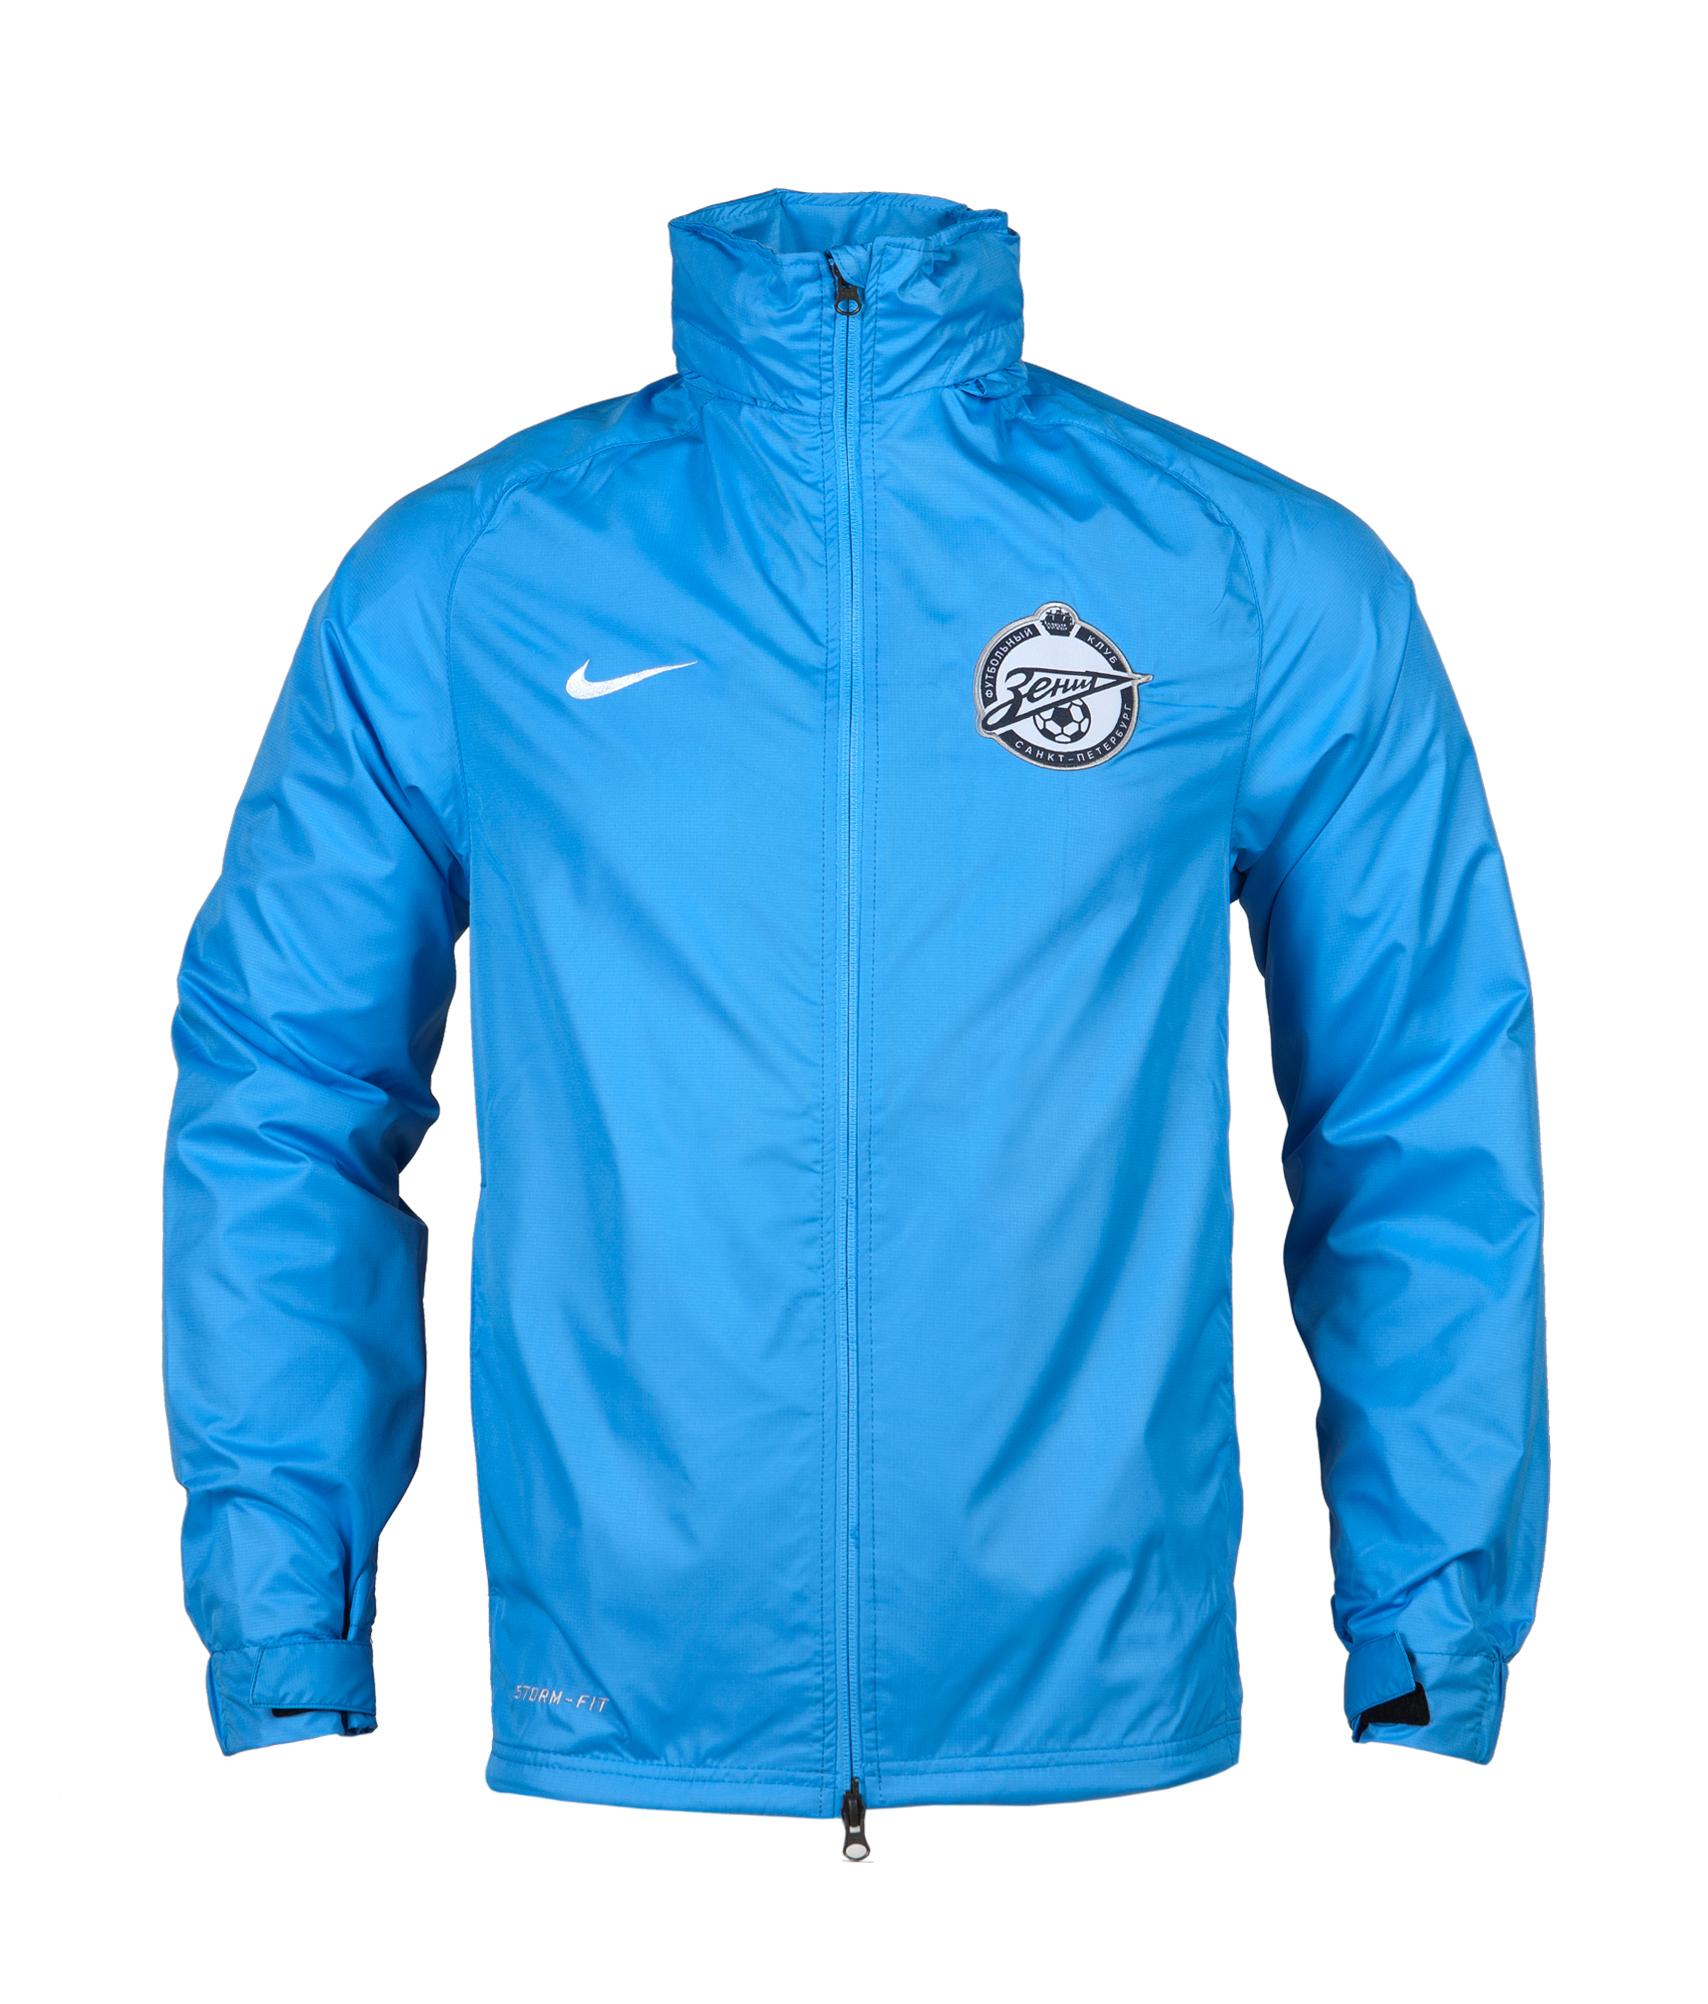 Ветровка Nike, Цвет-Синий, Размер-XL